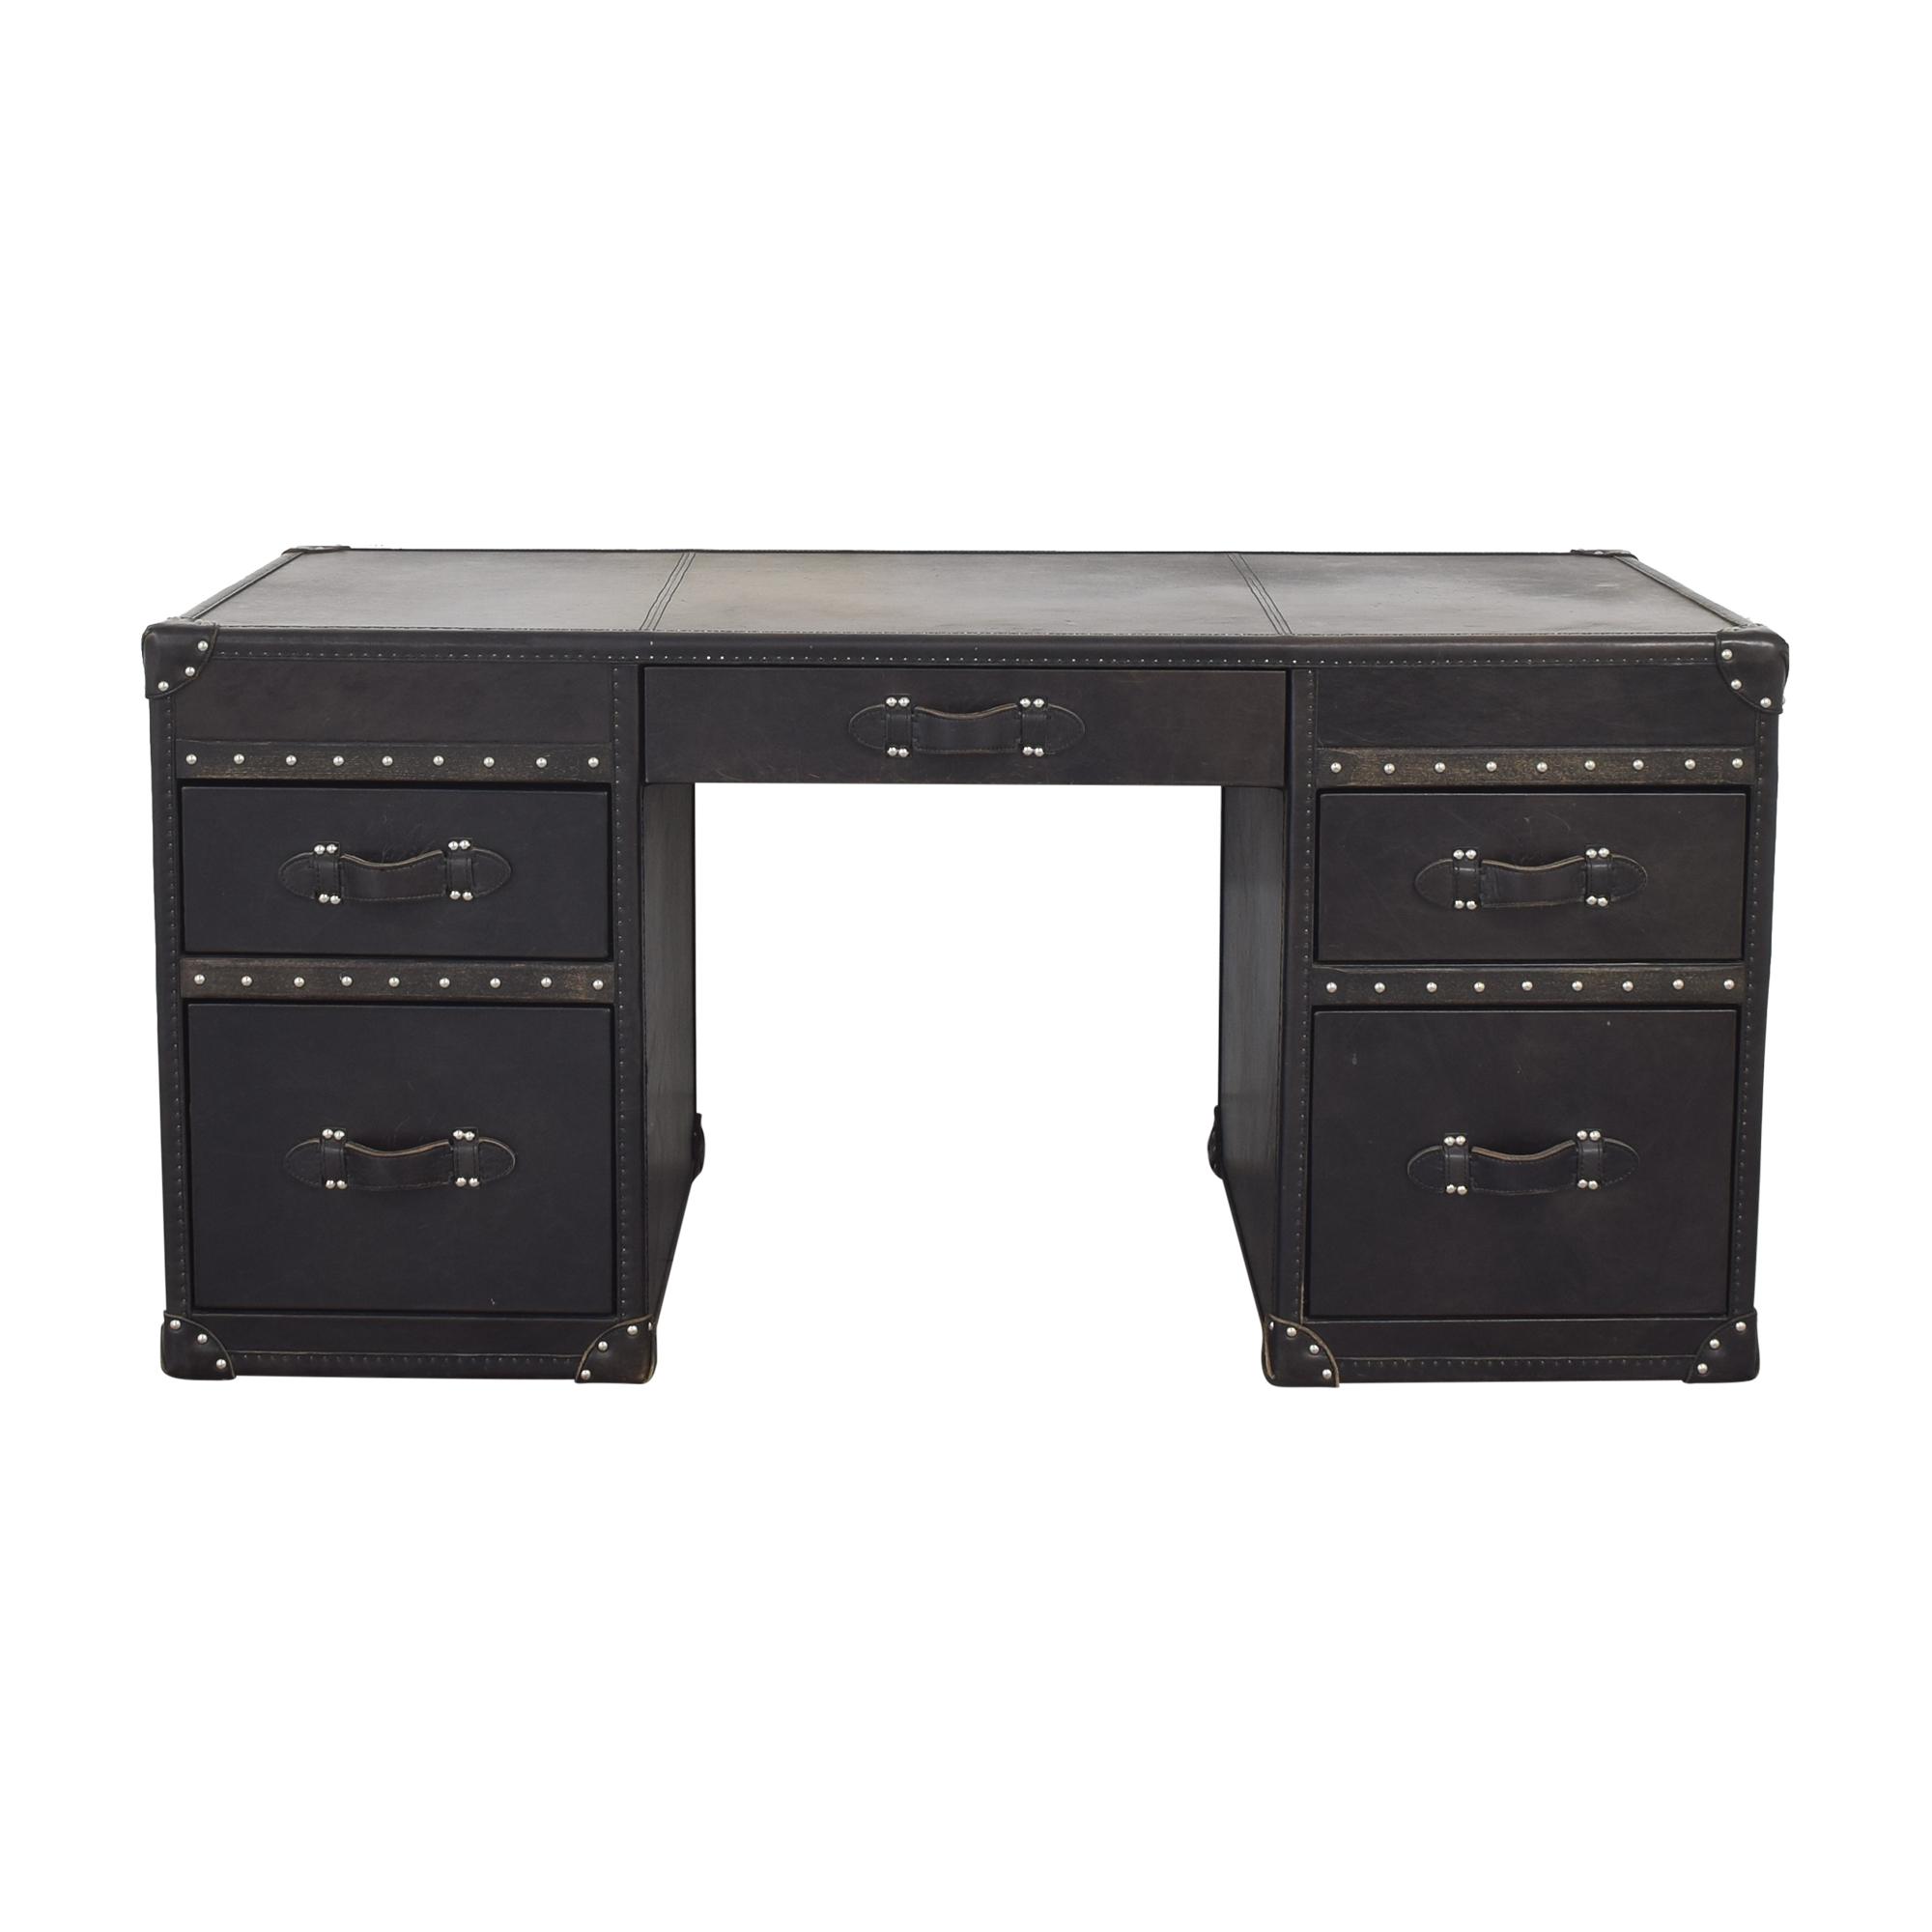 buy Restoration Hardware Restoration Hardware Mayfair Steamer Trunk Desk online